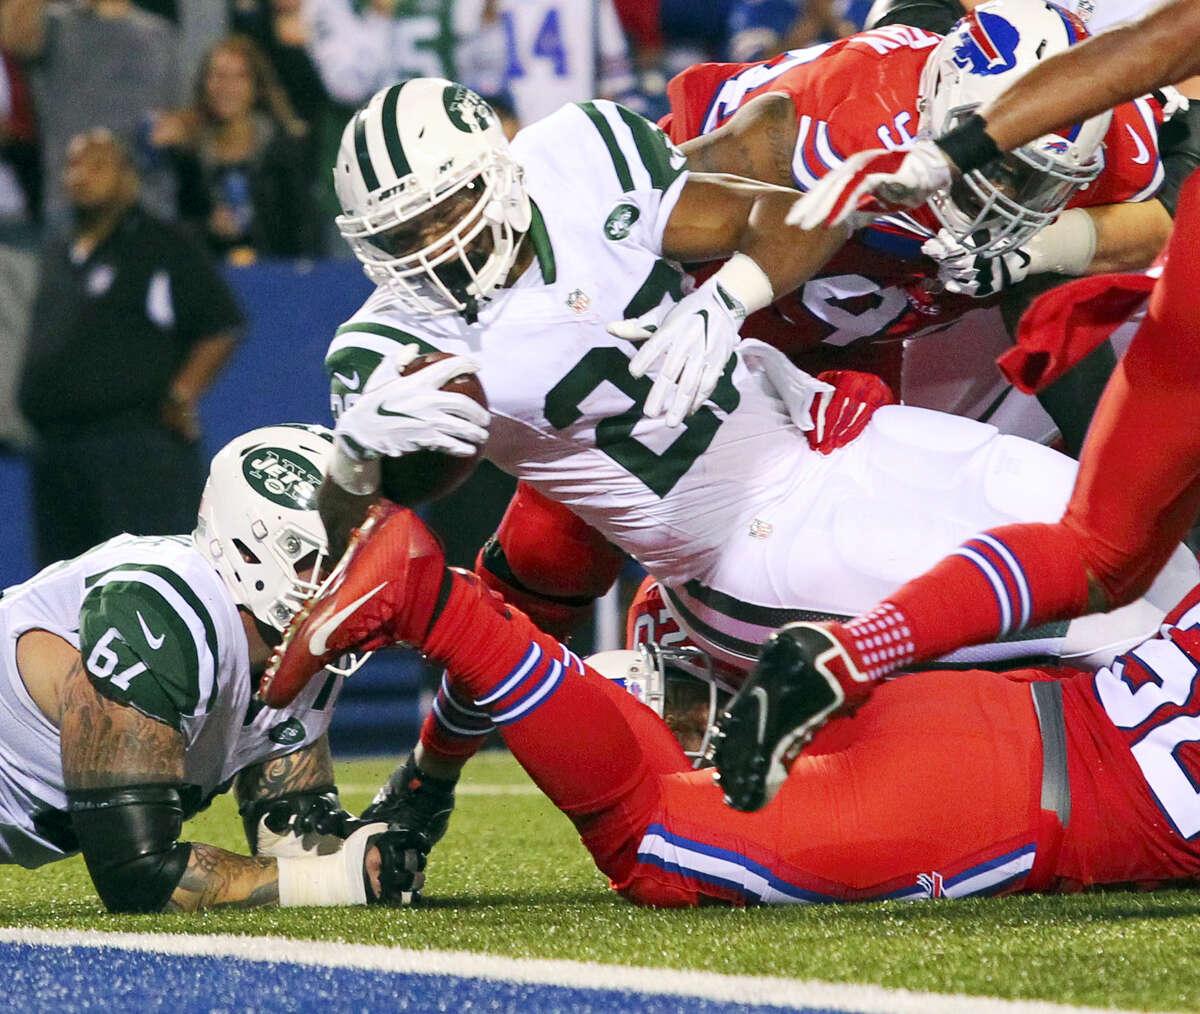 Jets running back Matt Forte (22) dives for a touchdown during the first half Thursday.